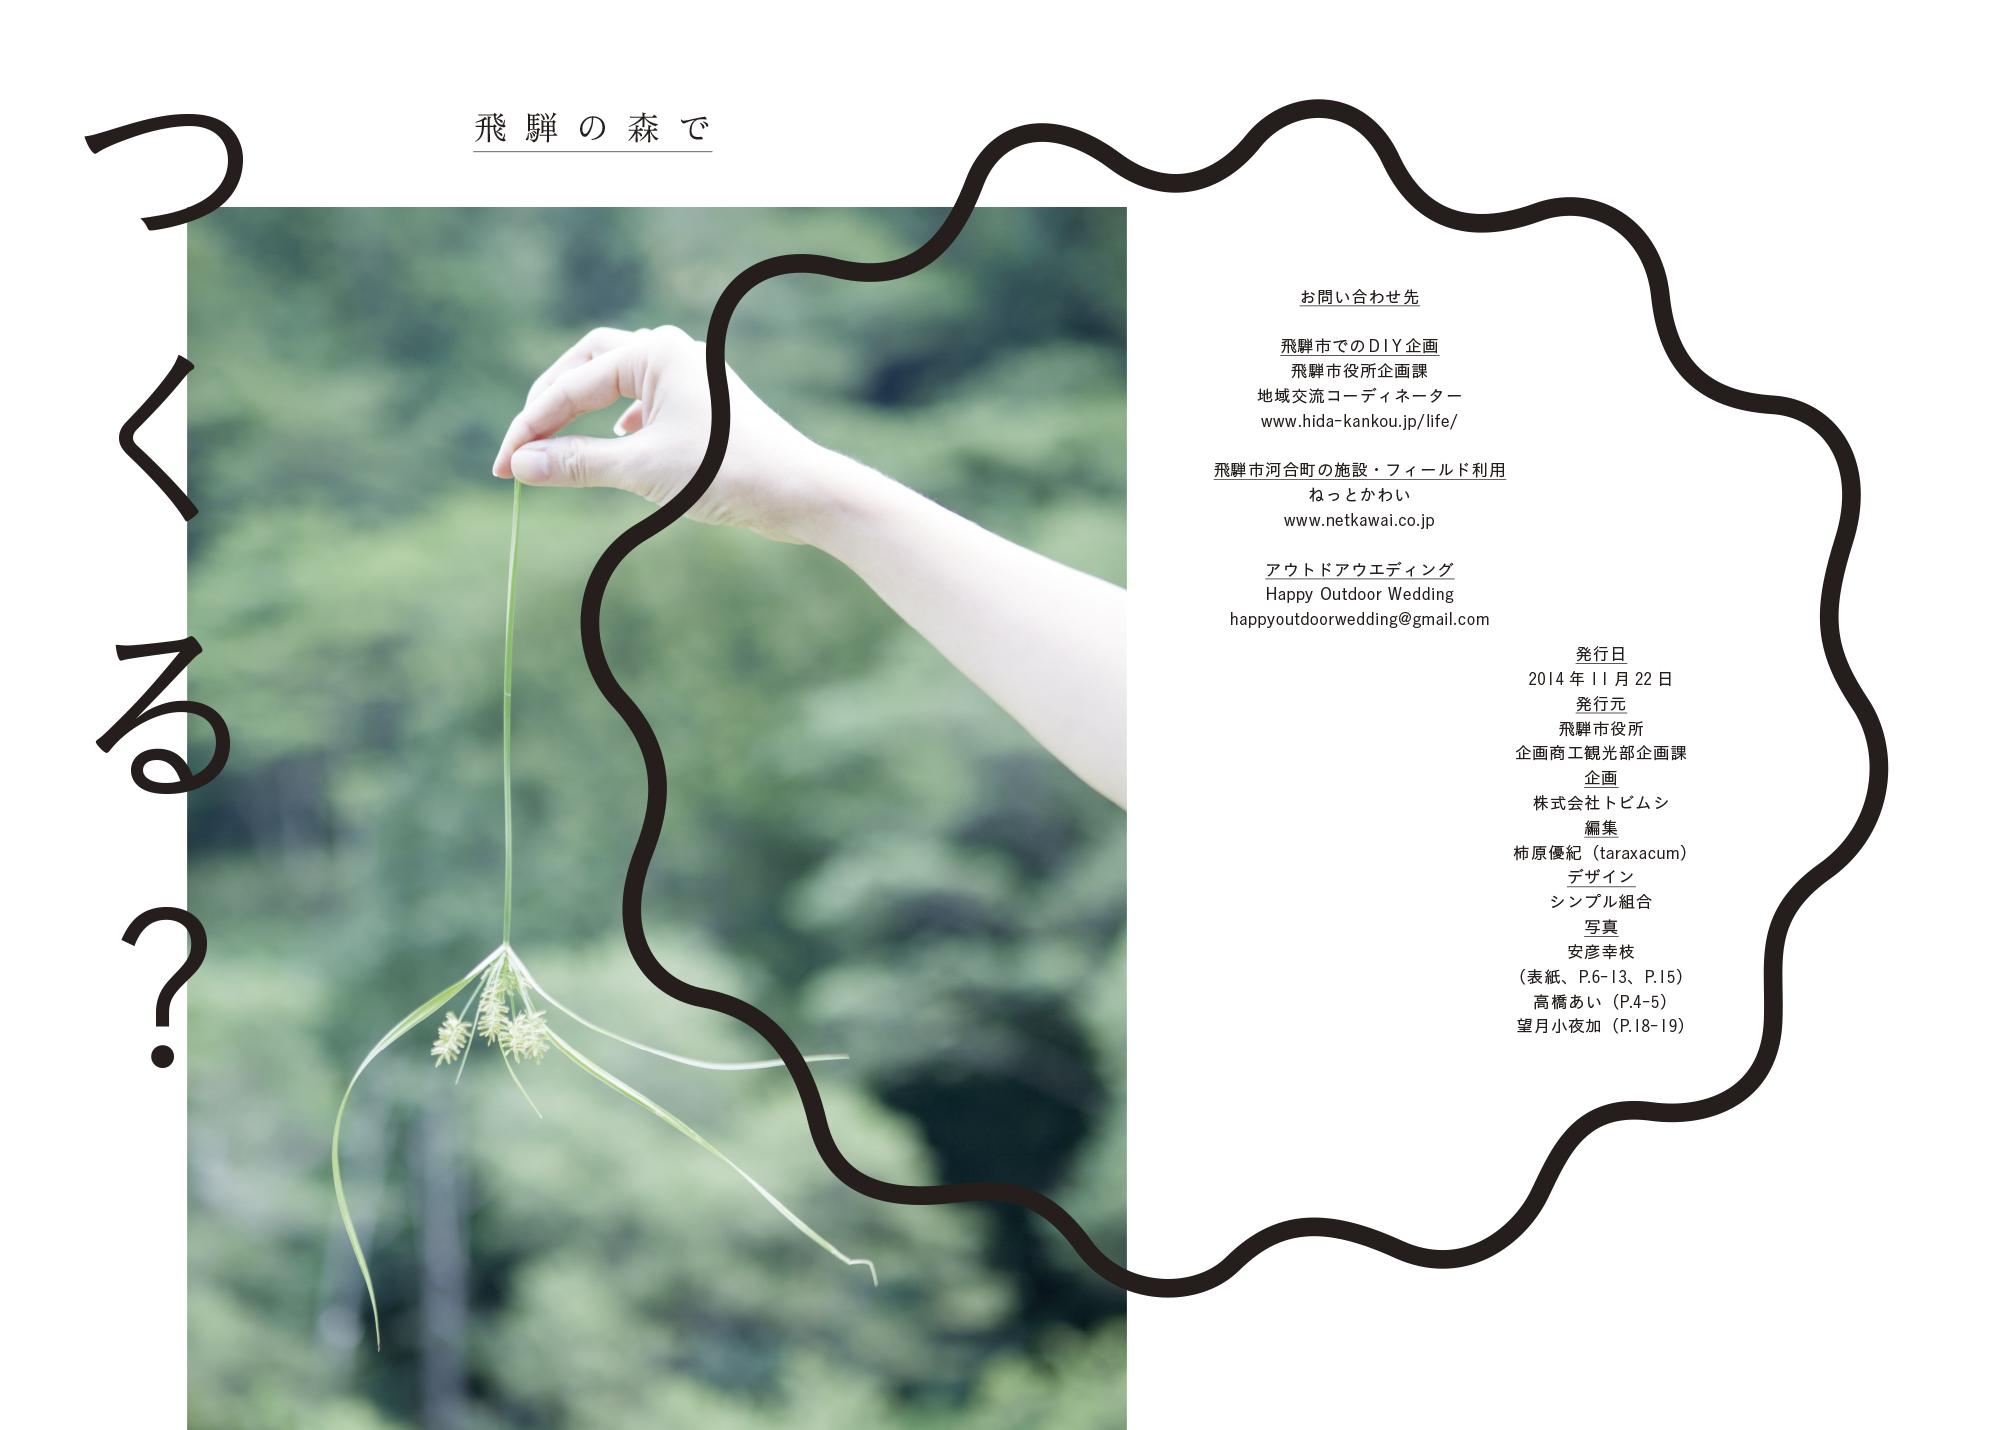 Hida_tsukuru_wk04.indd